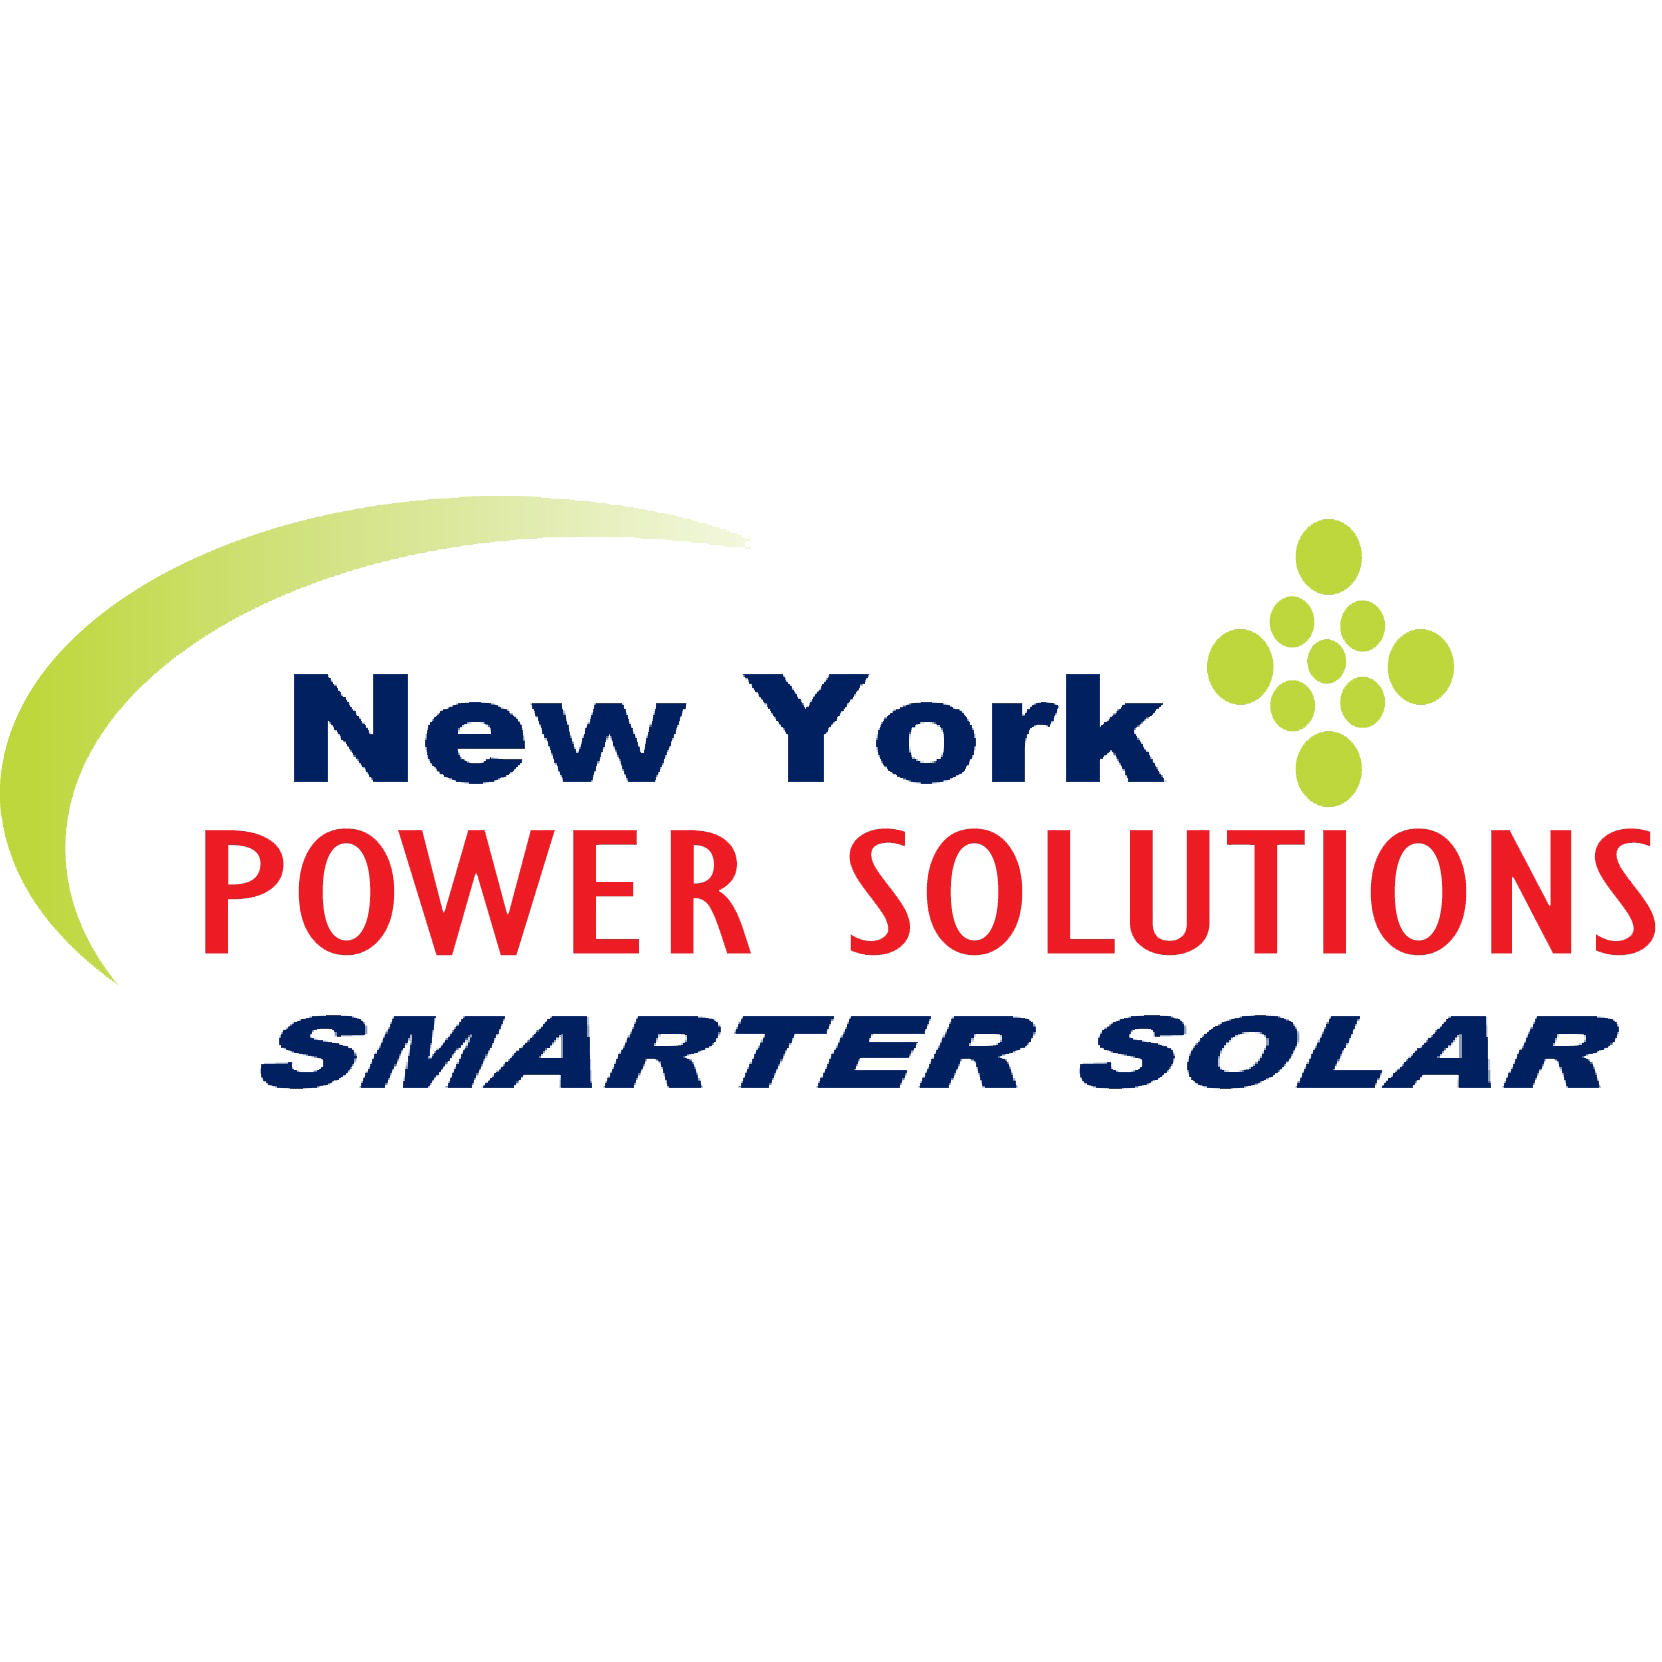 New York Power Solutions - Smarter Solar